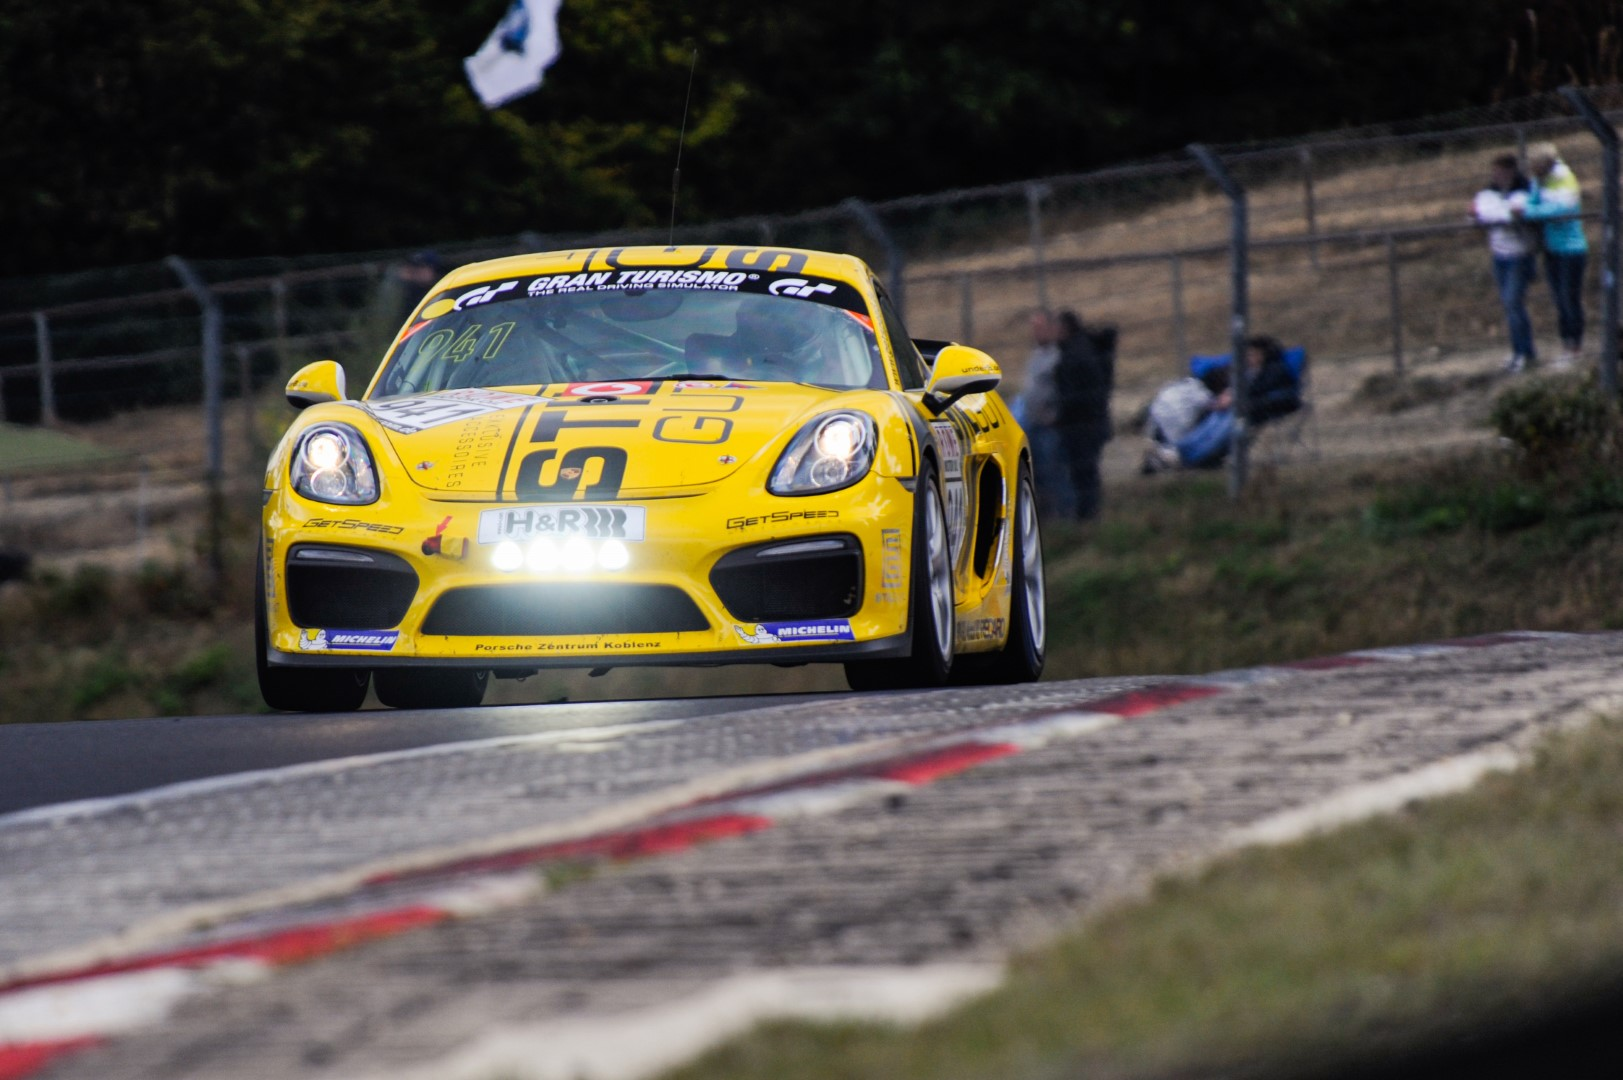 VLN 7. Lauf 2018, Nürburgring-Nordschleife - Foto: Gruppe C Photography; #941 Porsche Cayman GT4 CS, Getspeed Performance: Carrie Schreiner, Daniel Mursch